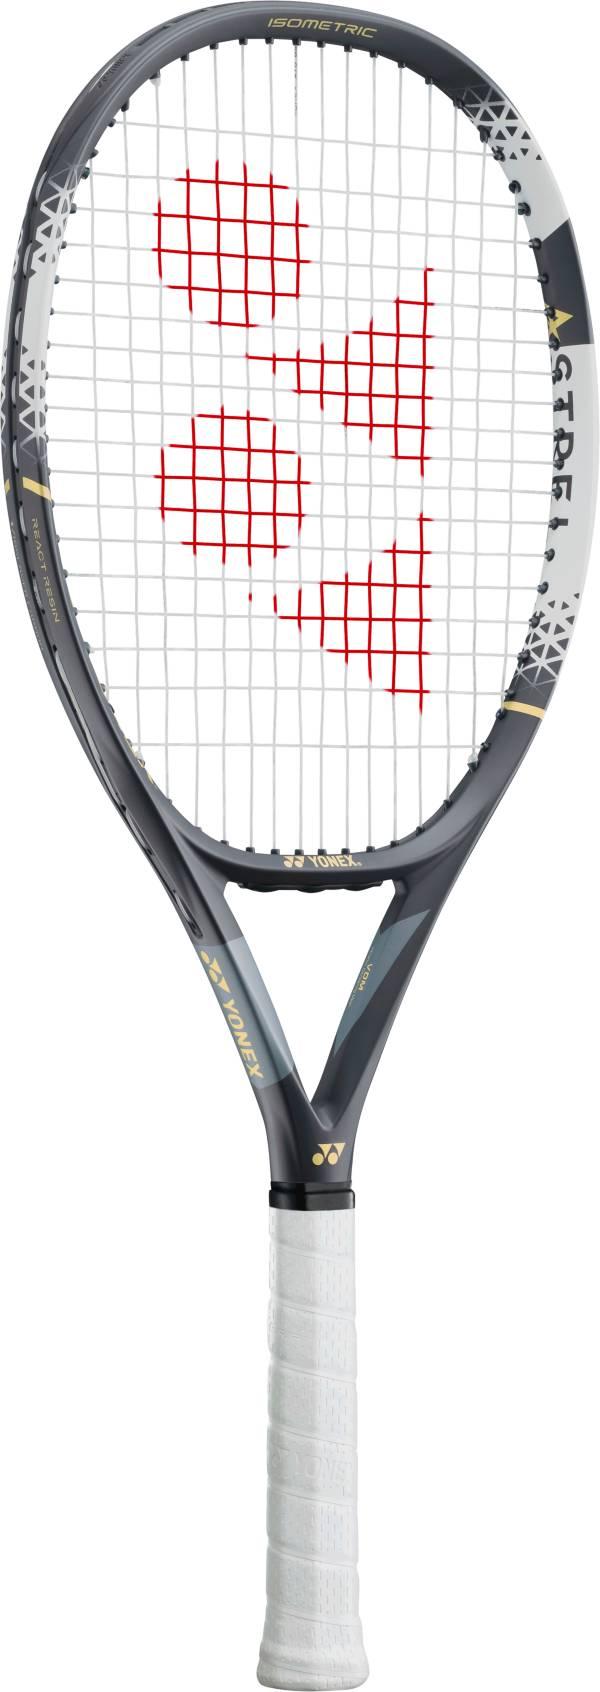 Yonex Astrel 105 Tennis Racquet product image